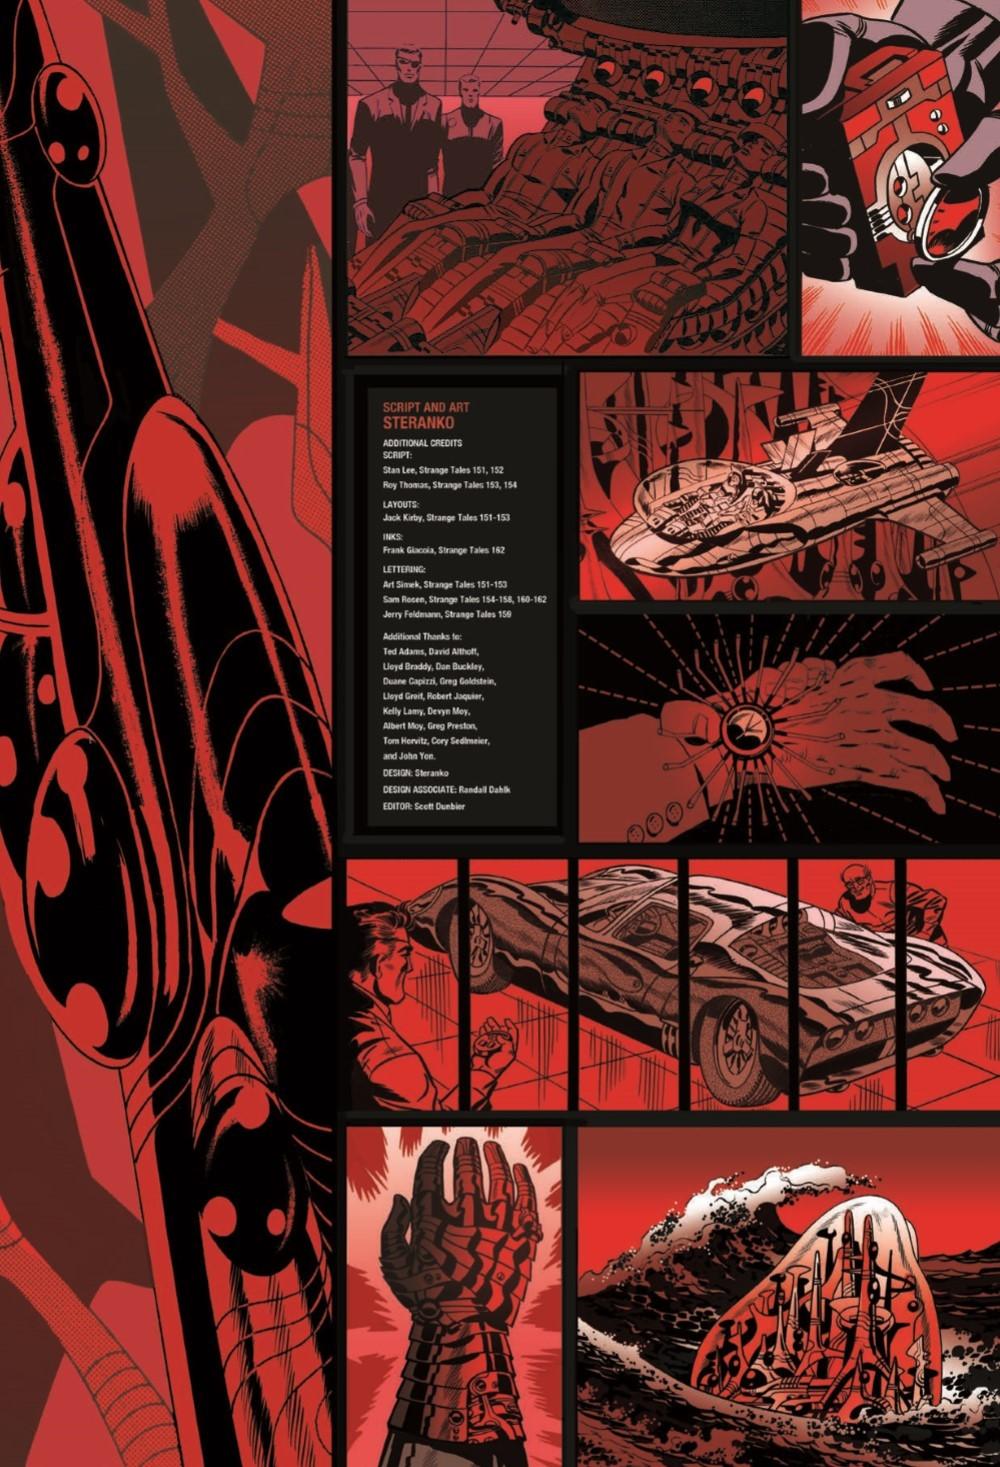 STERANKO_artisan_edition_pr-3 ComicList Previews: JIM STERANKO'S NICK FURY AGENT OF S.H.I.E.L.D. ARTISAN EDITION TP